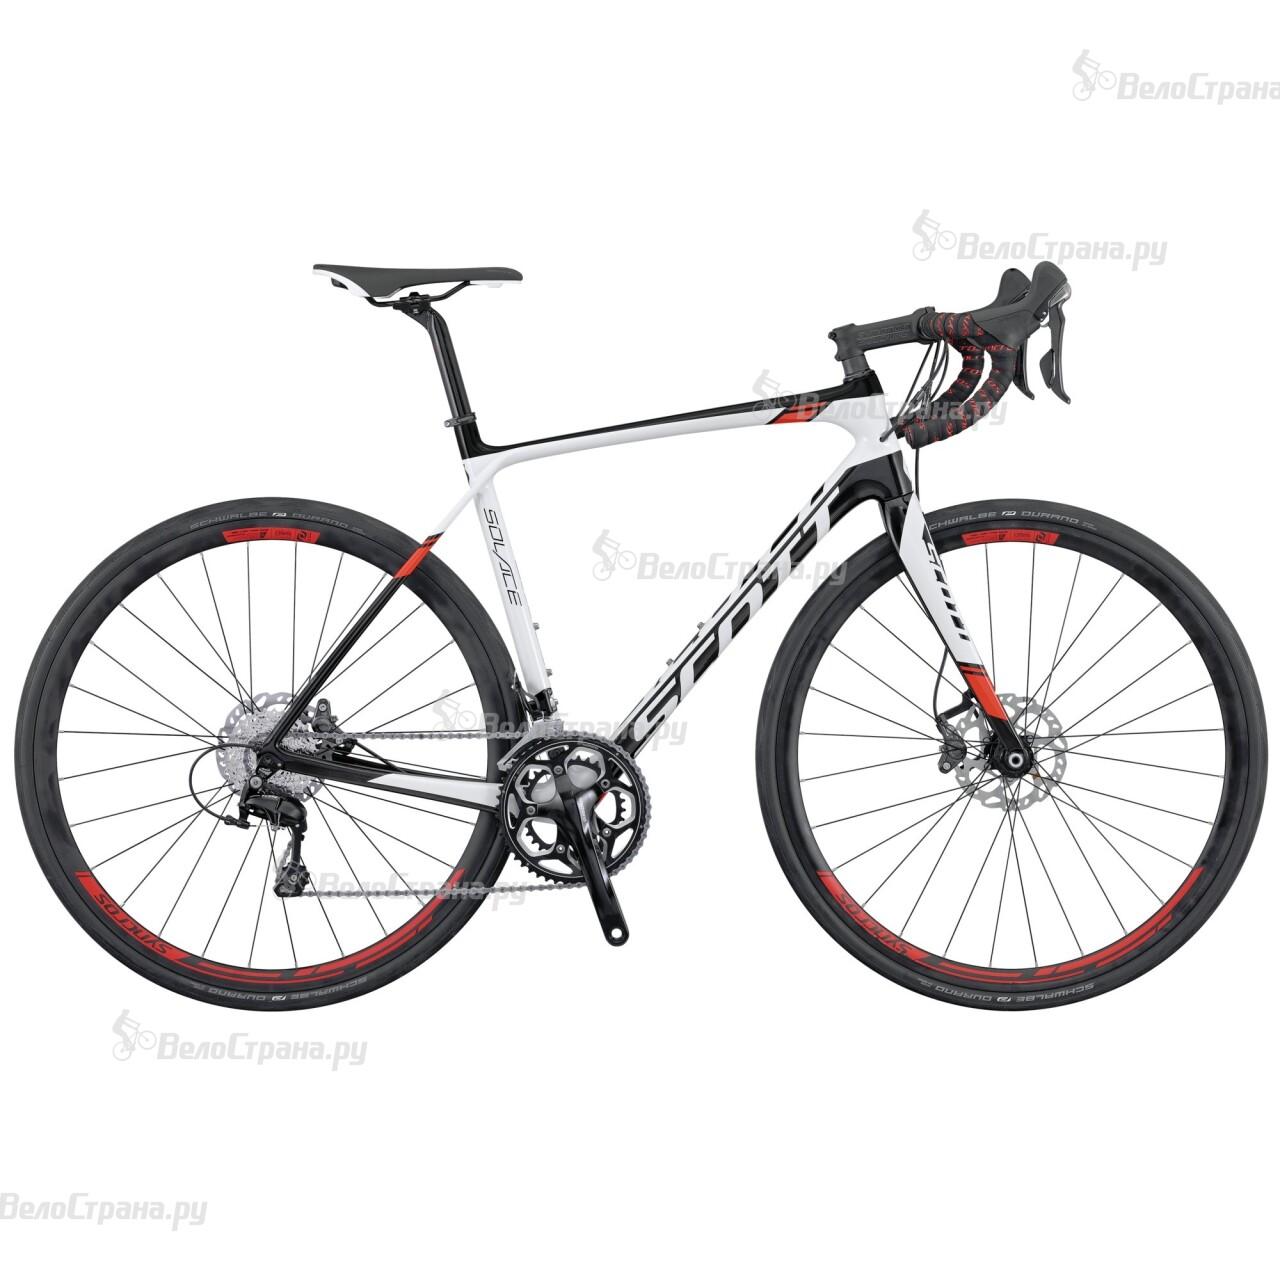 Велосипед Scott Solace 20 Disc (2016) велосипед scott contessa solace 15 compact 2015